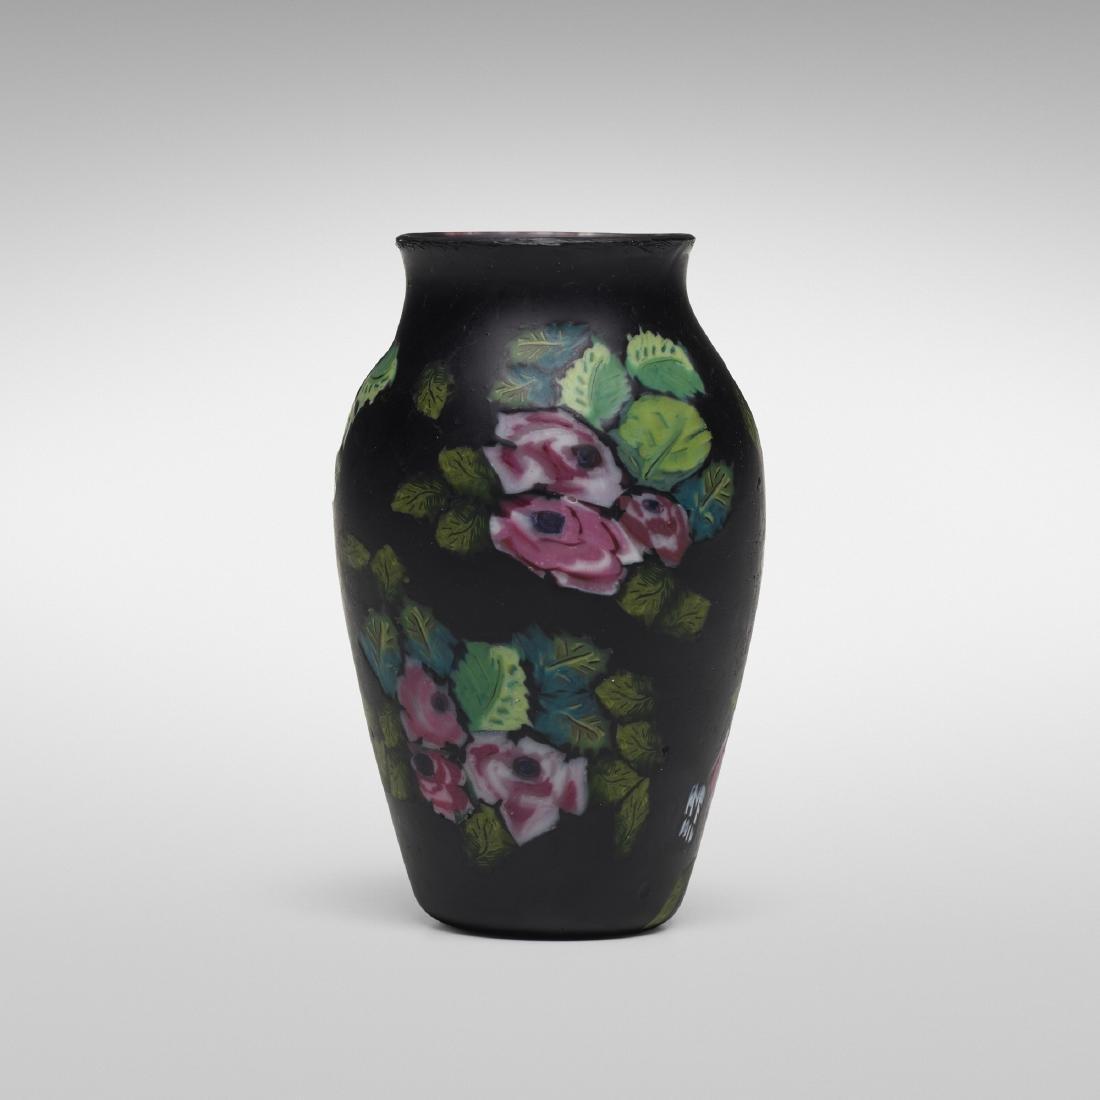 Giuseppe Barovier, A Murrine Floreali vase